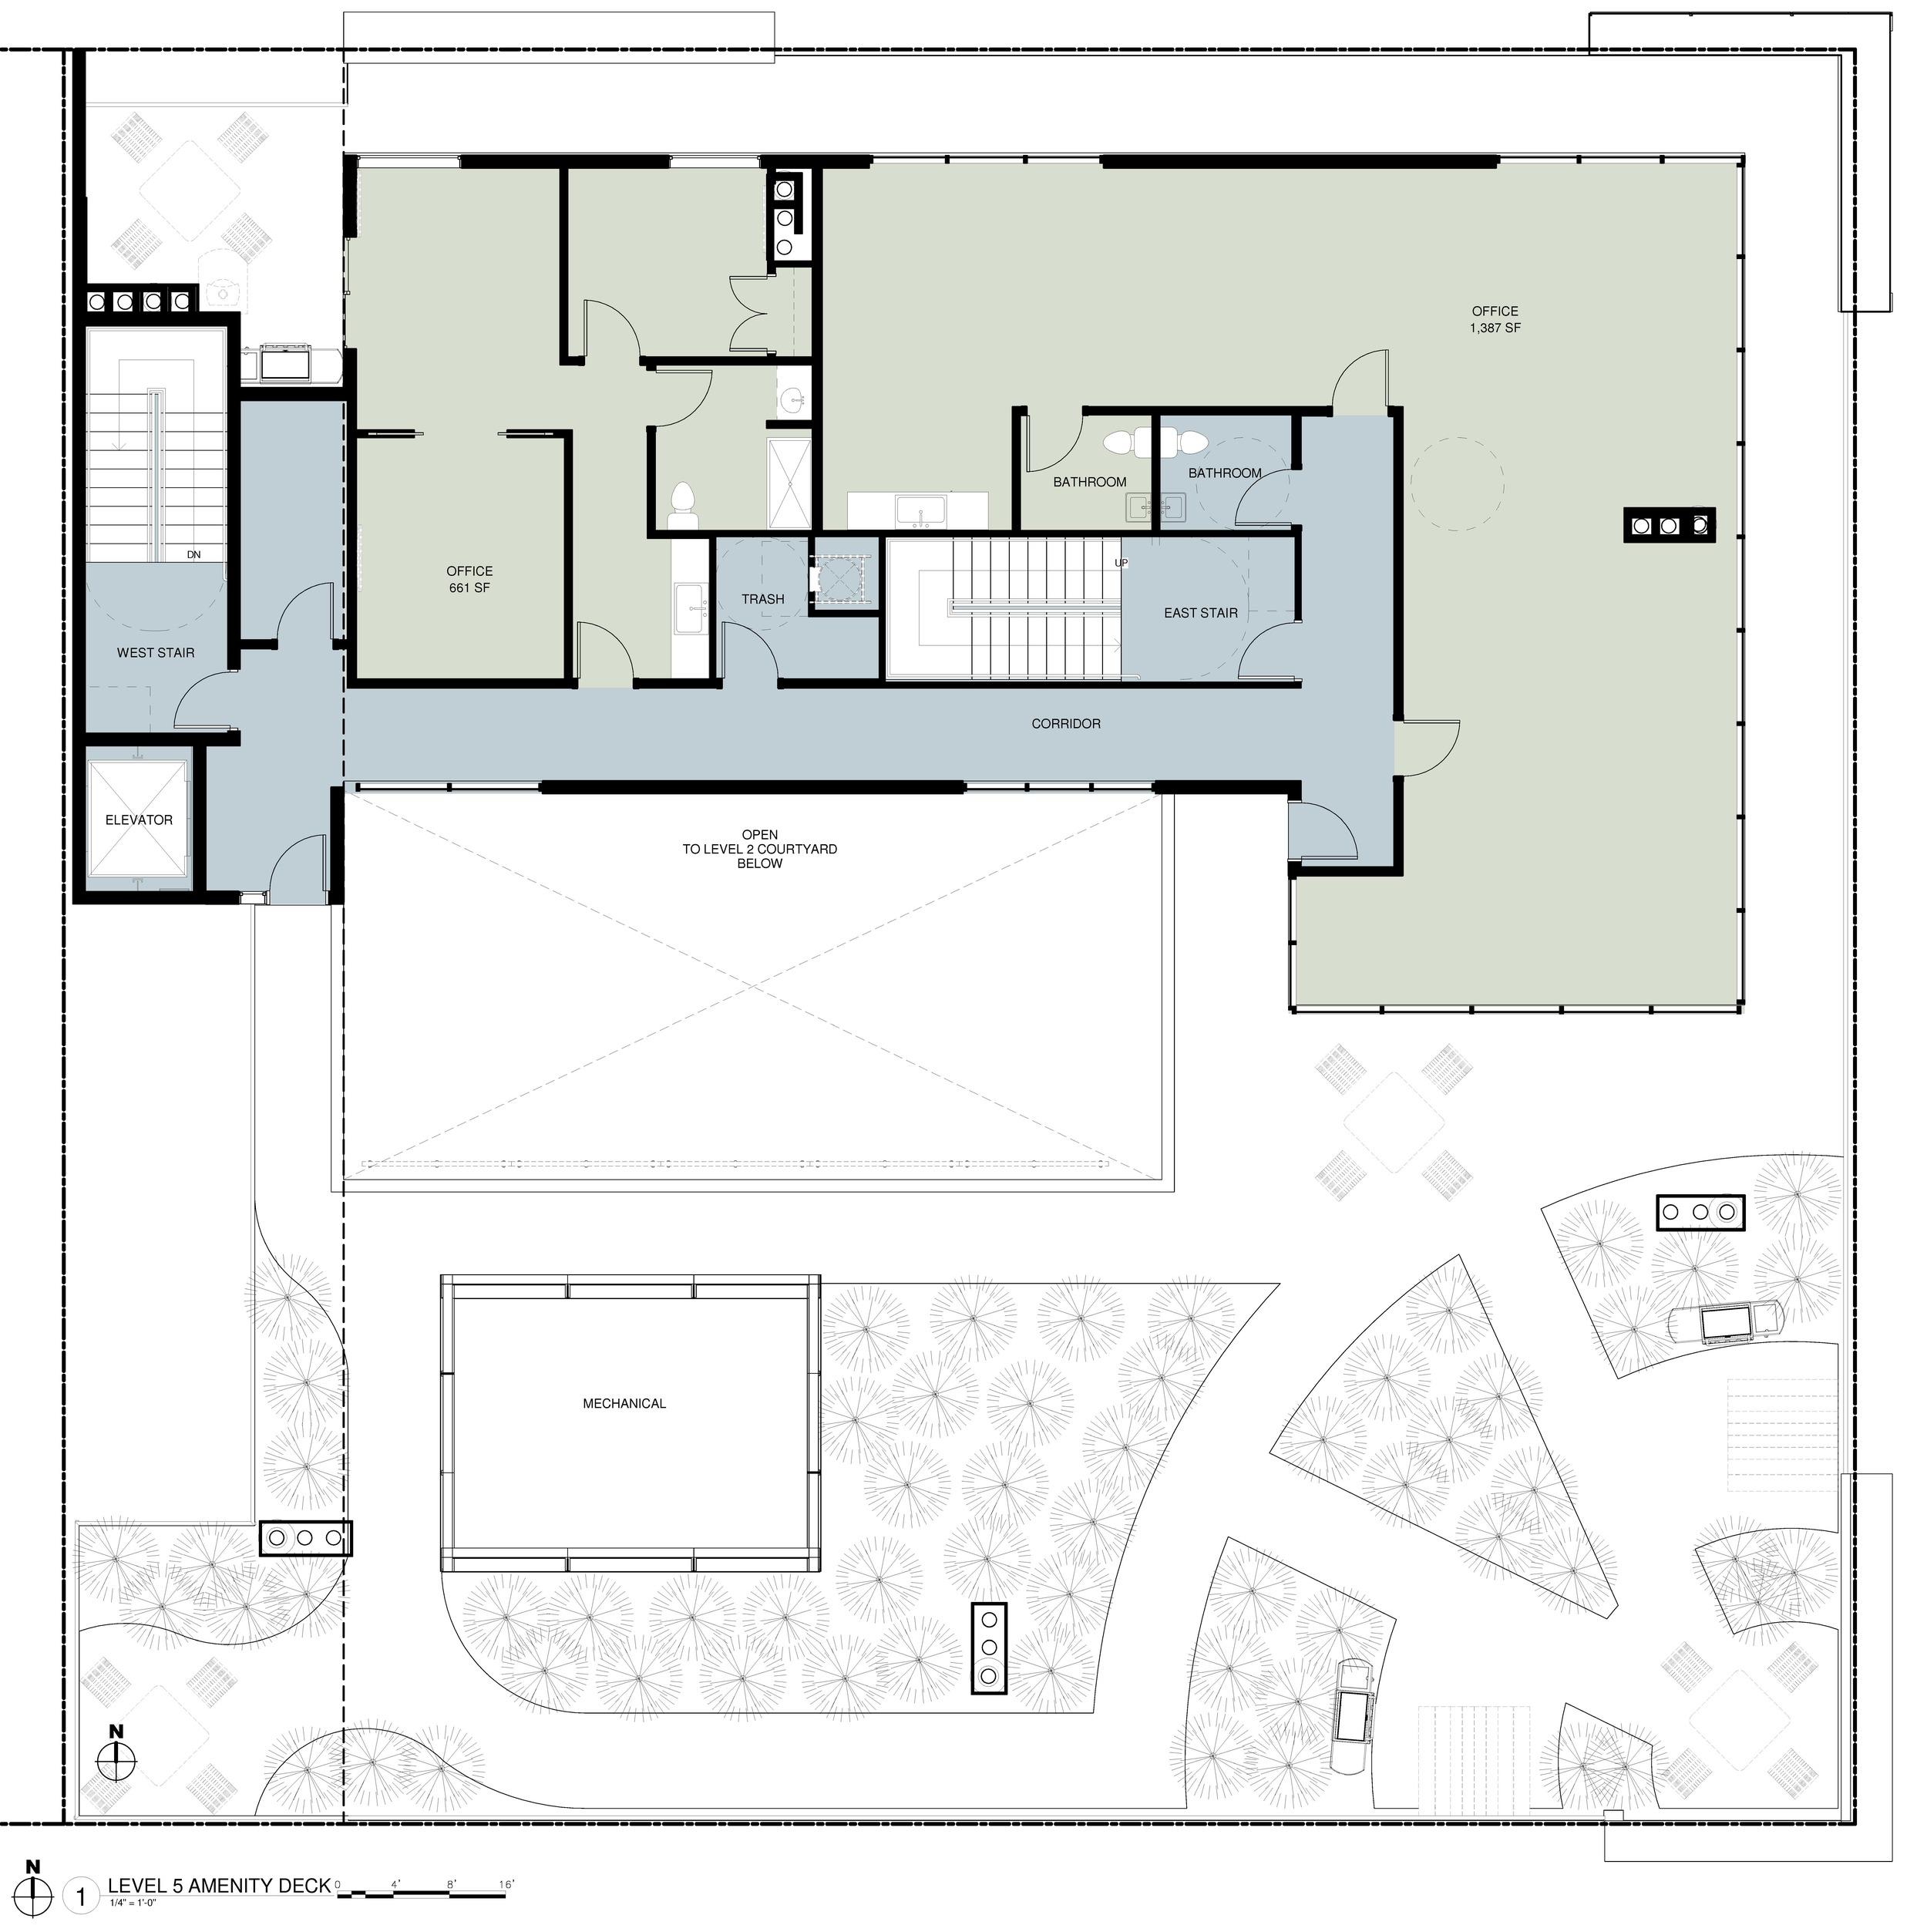 Top Floor Plan - Office, Green Roof and Tenant Amenities